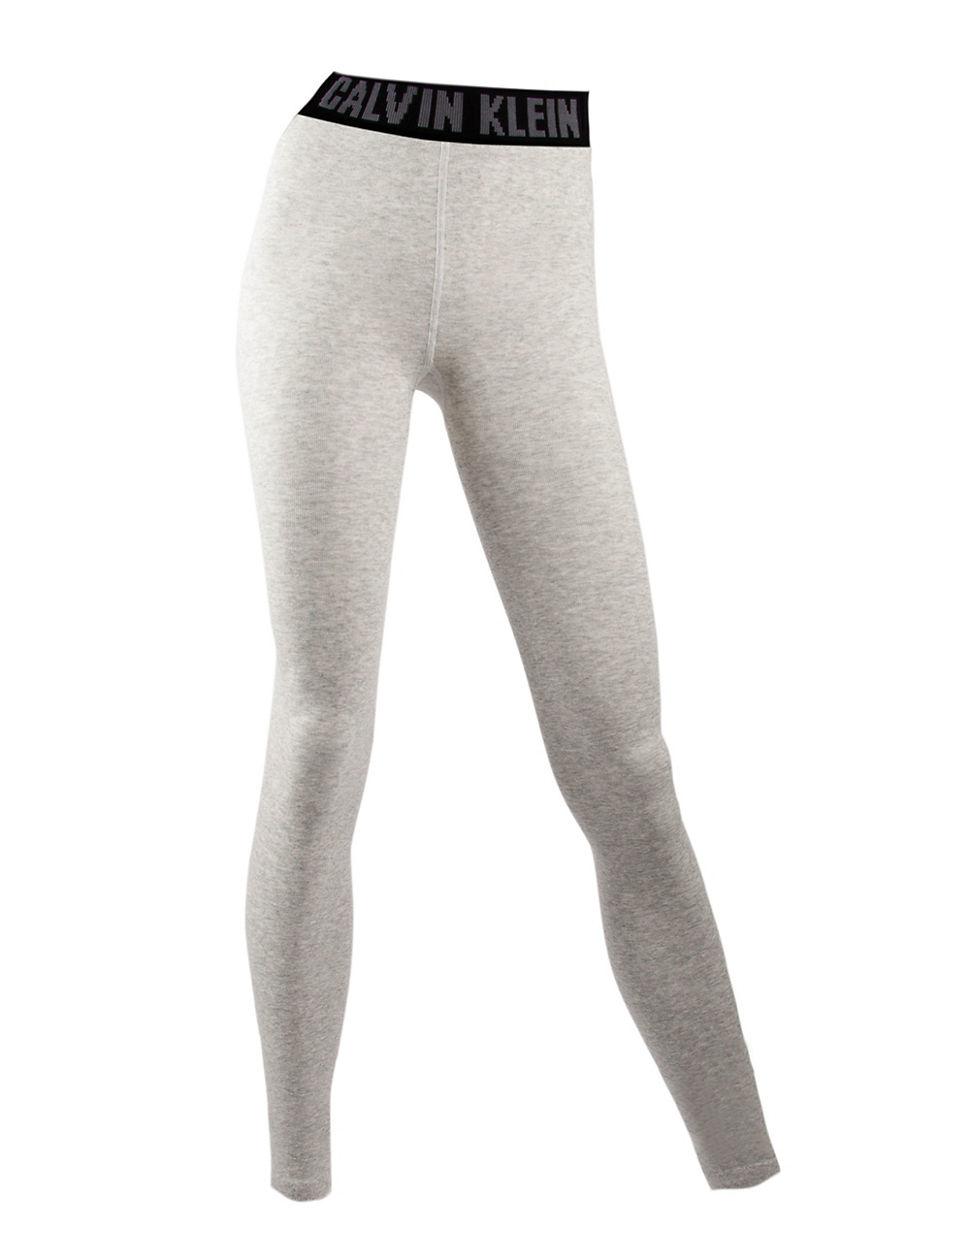 calvin klein logo waistband leggings in gray lyst. Black Bedroom Furniture Sets. Home Design Ideas